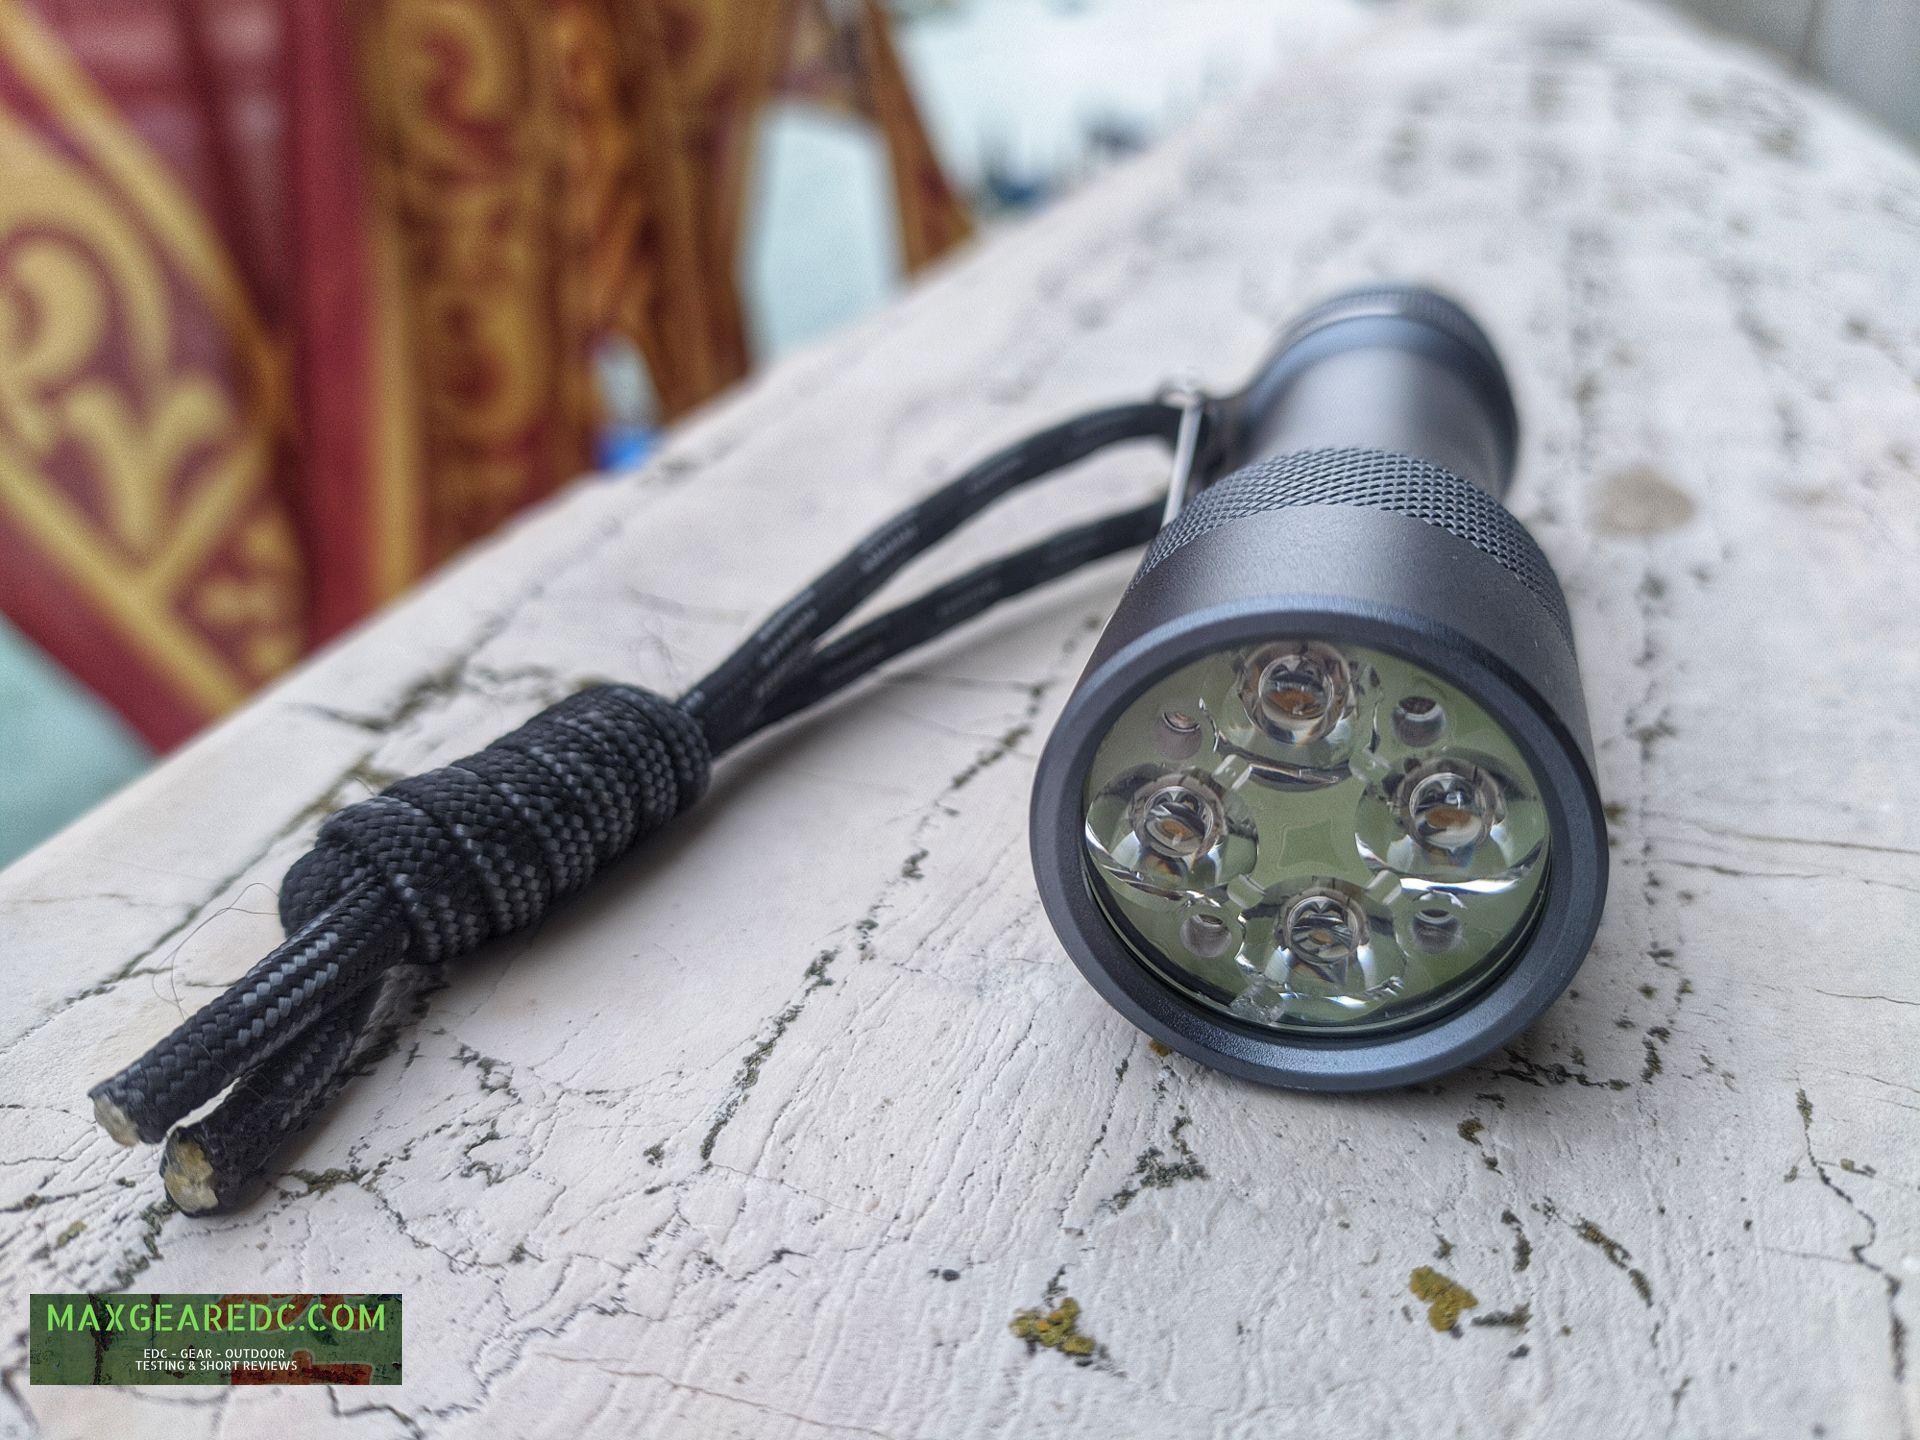 Lumintop_FW4A_Flashlight_Review_Aluminium_18650_maxgearedc.com_EDC_GEAR_OUTDOOR_TESTING_and_SHORT_REVIEWS_2